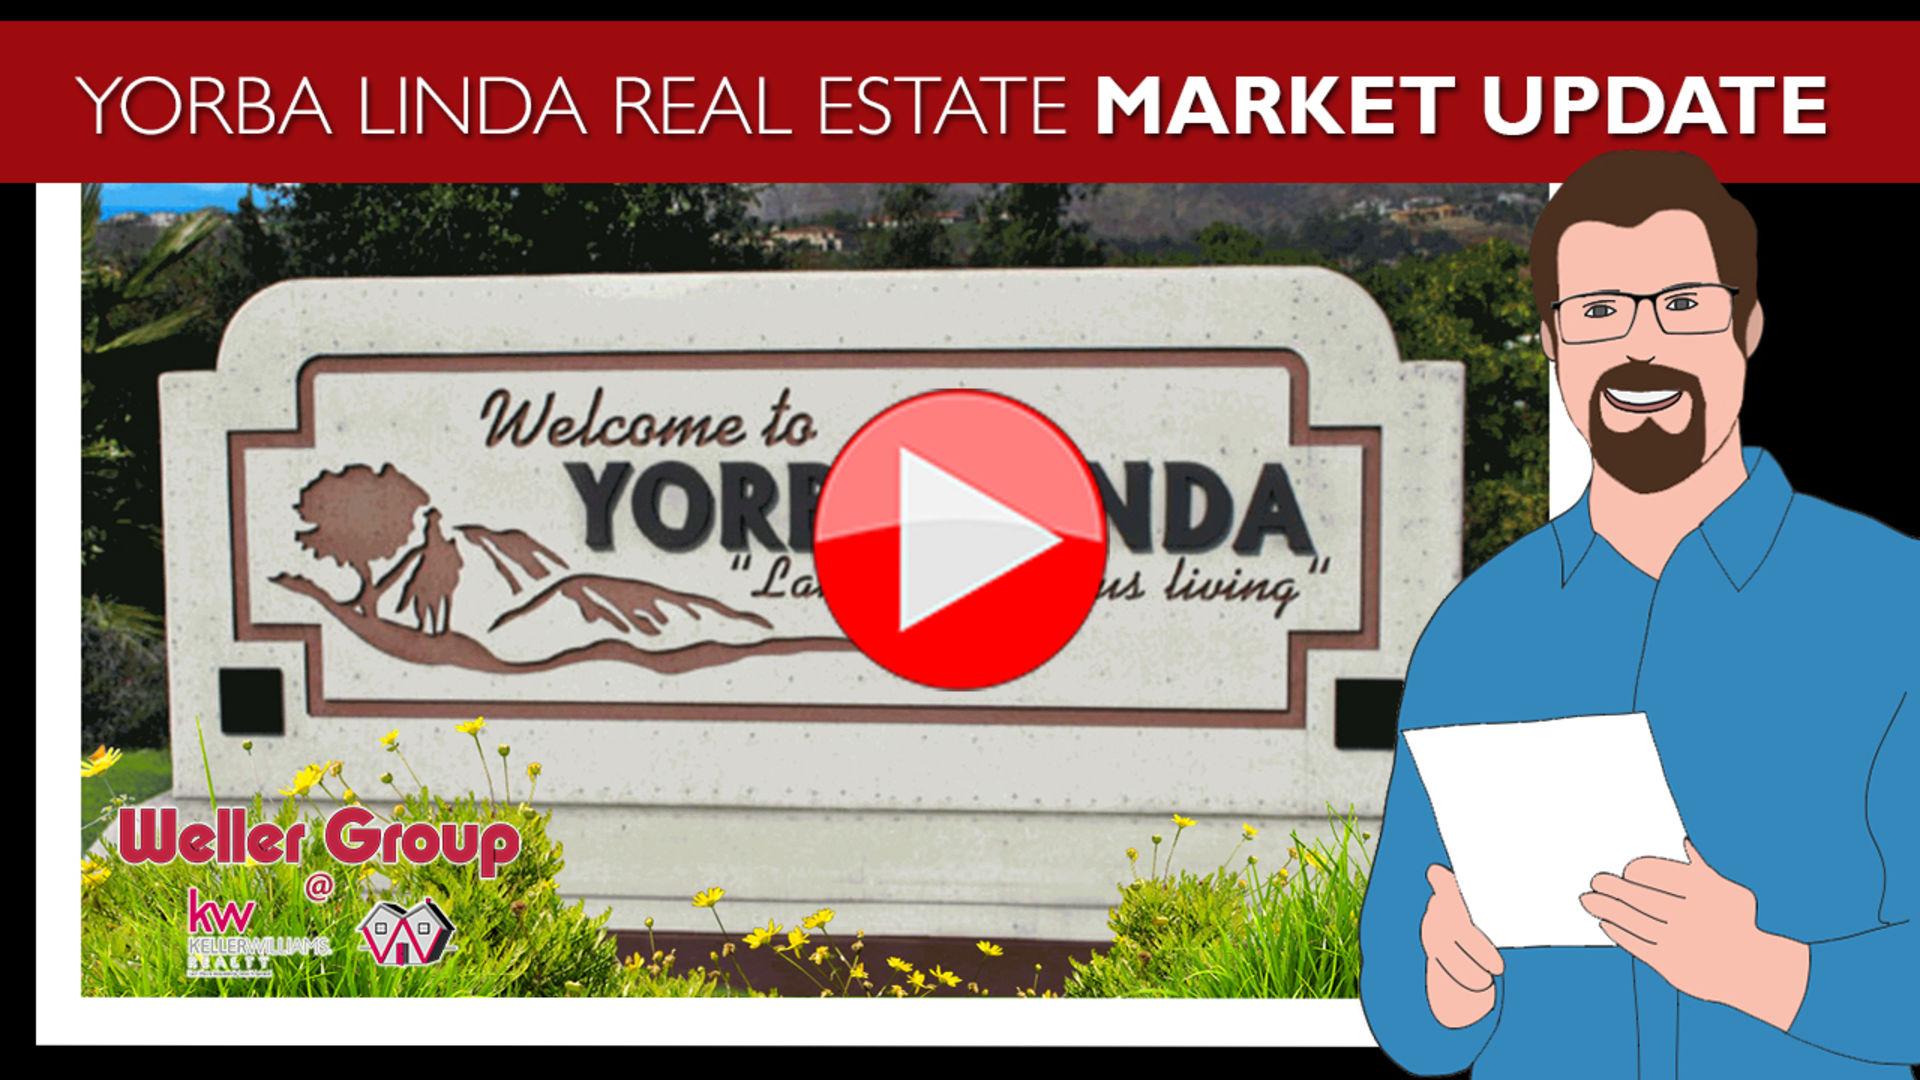 Turkey Time Update for Yorba Linda Real Estate